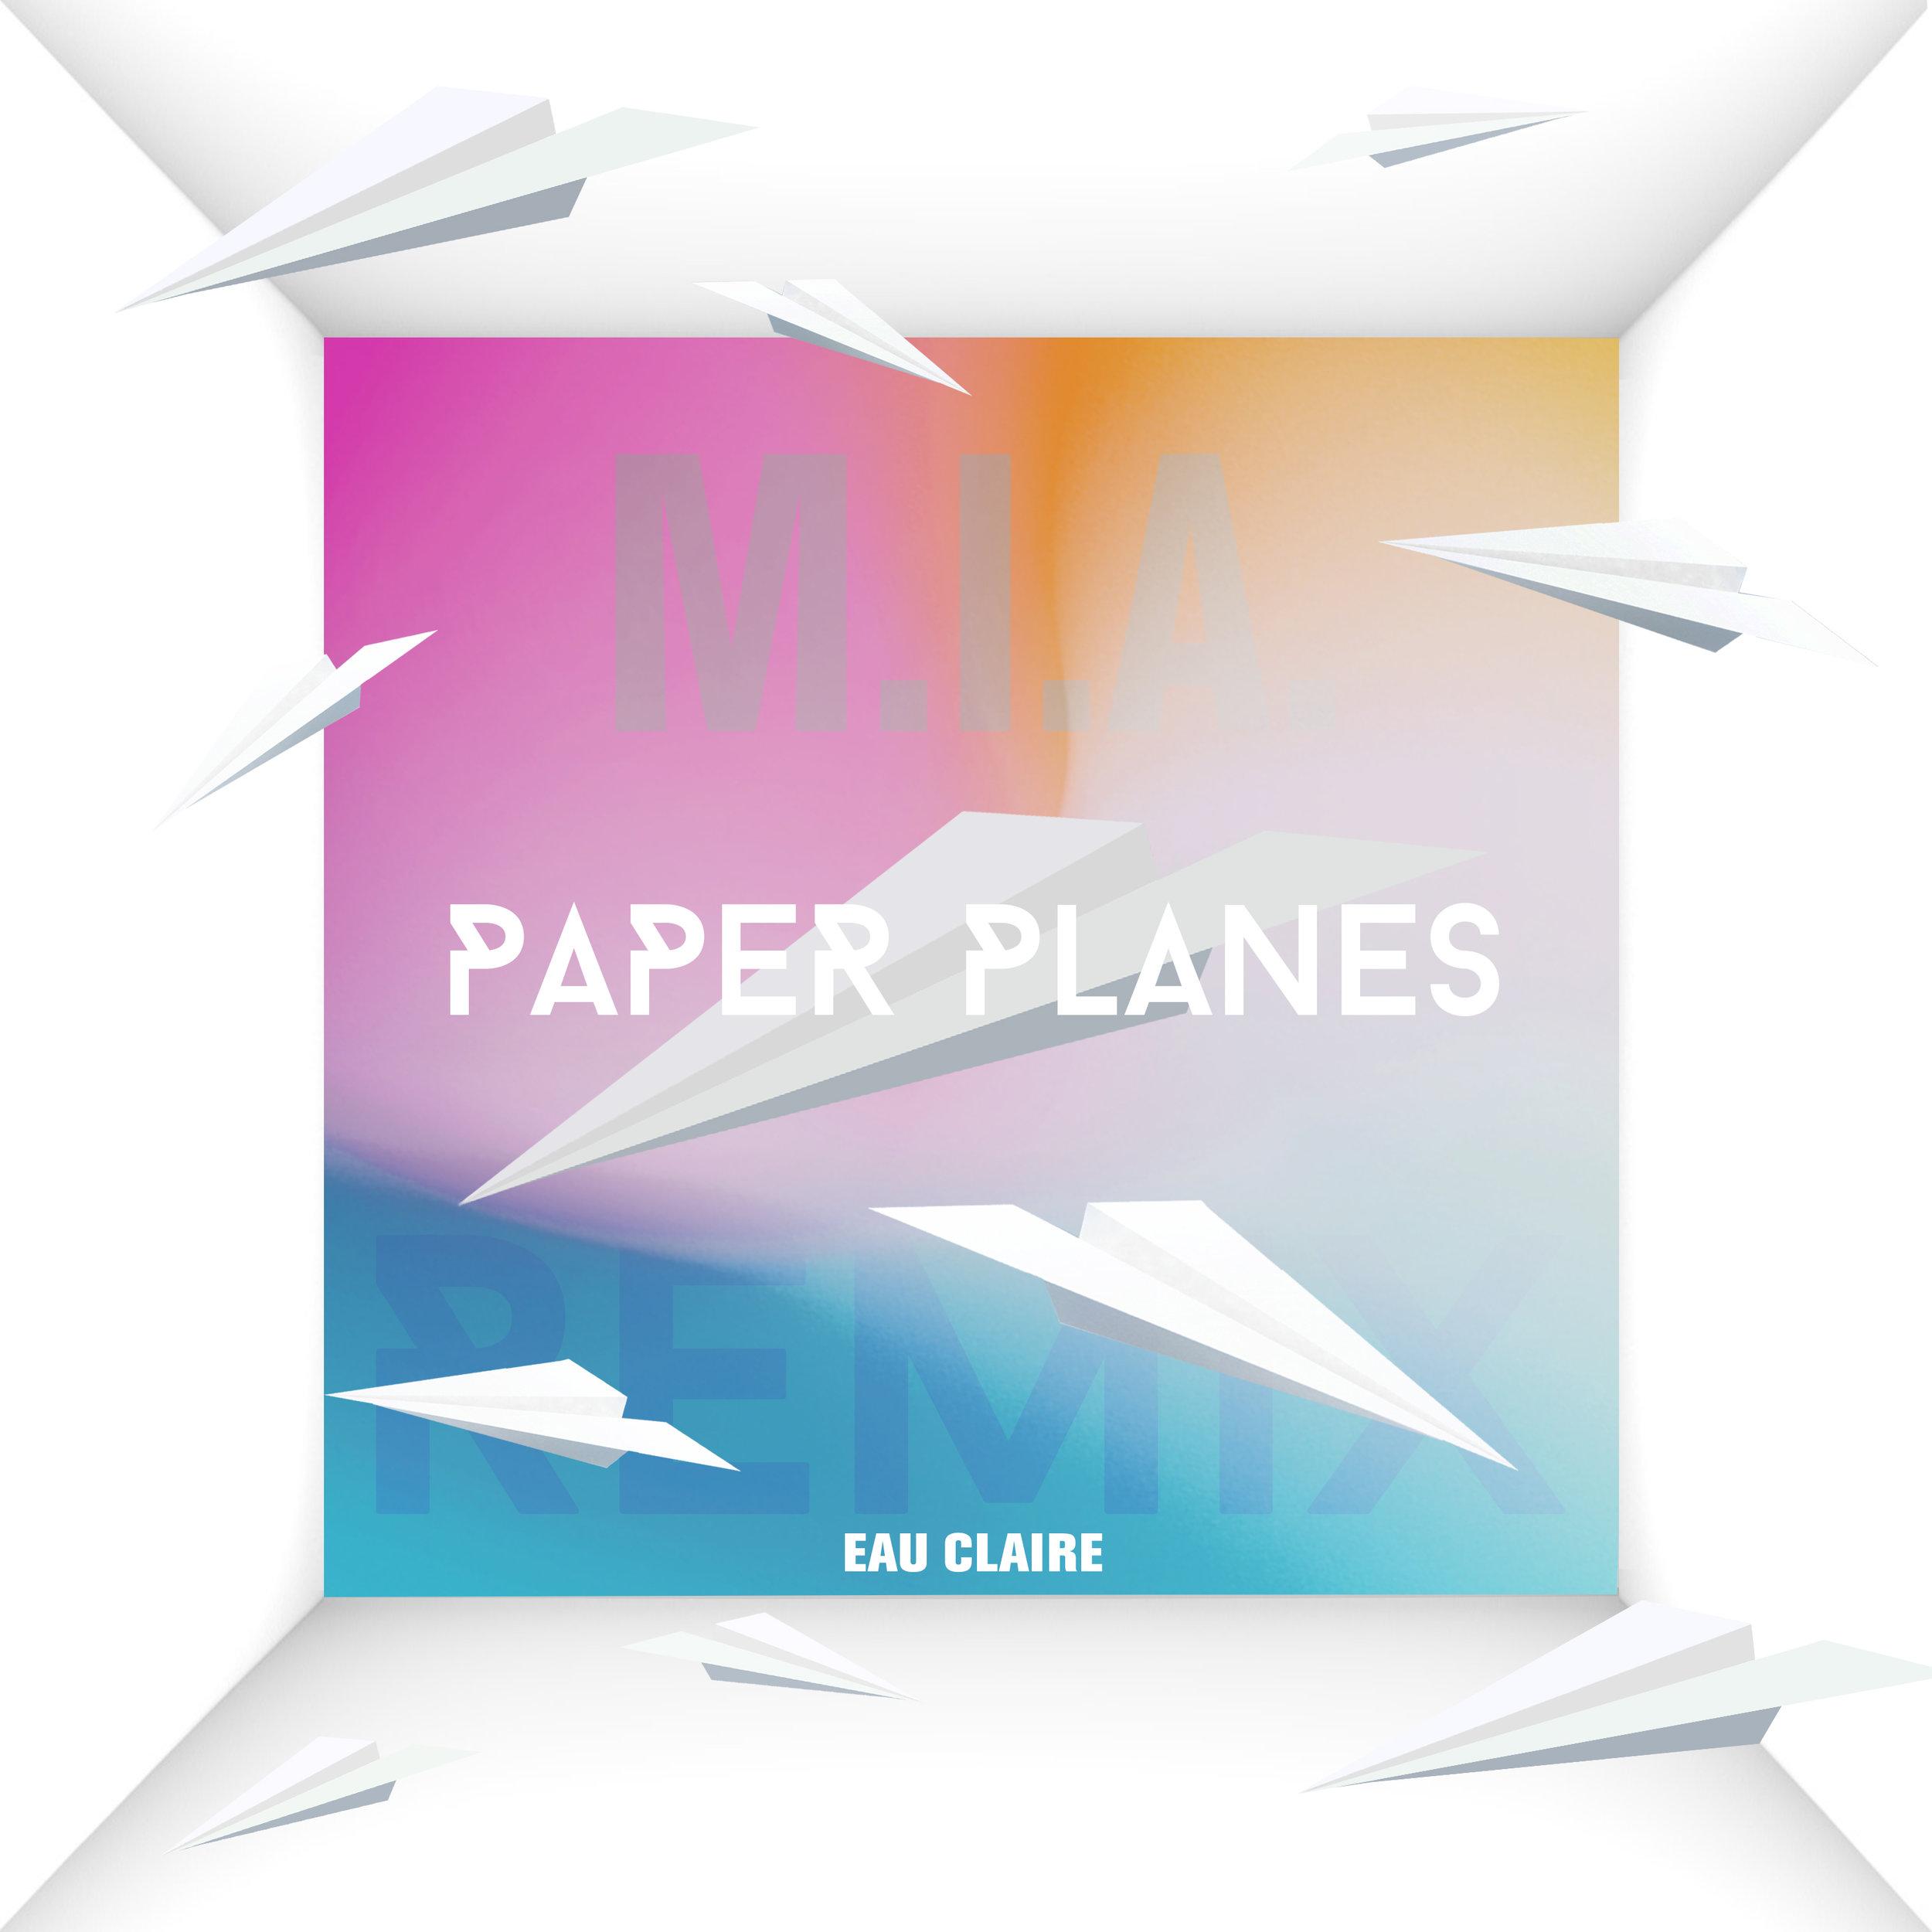 MIA_PAPER_PLANES_REMIX